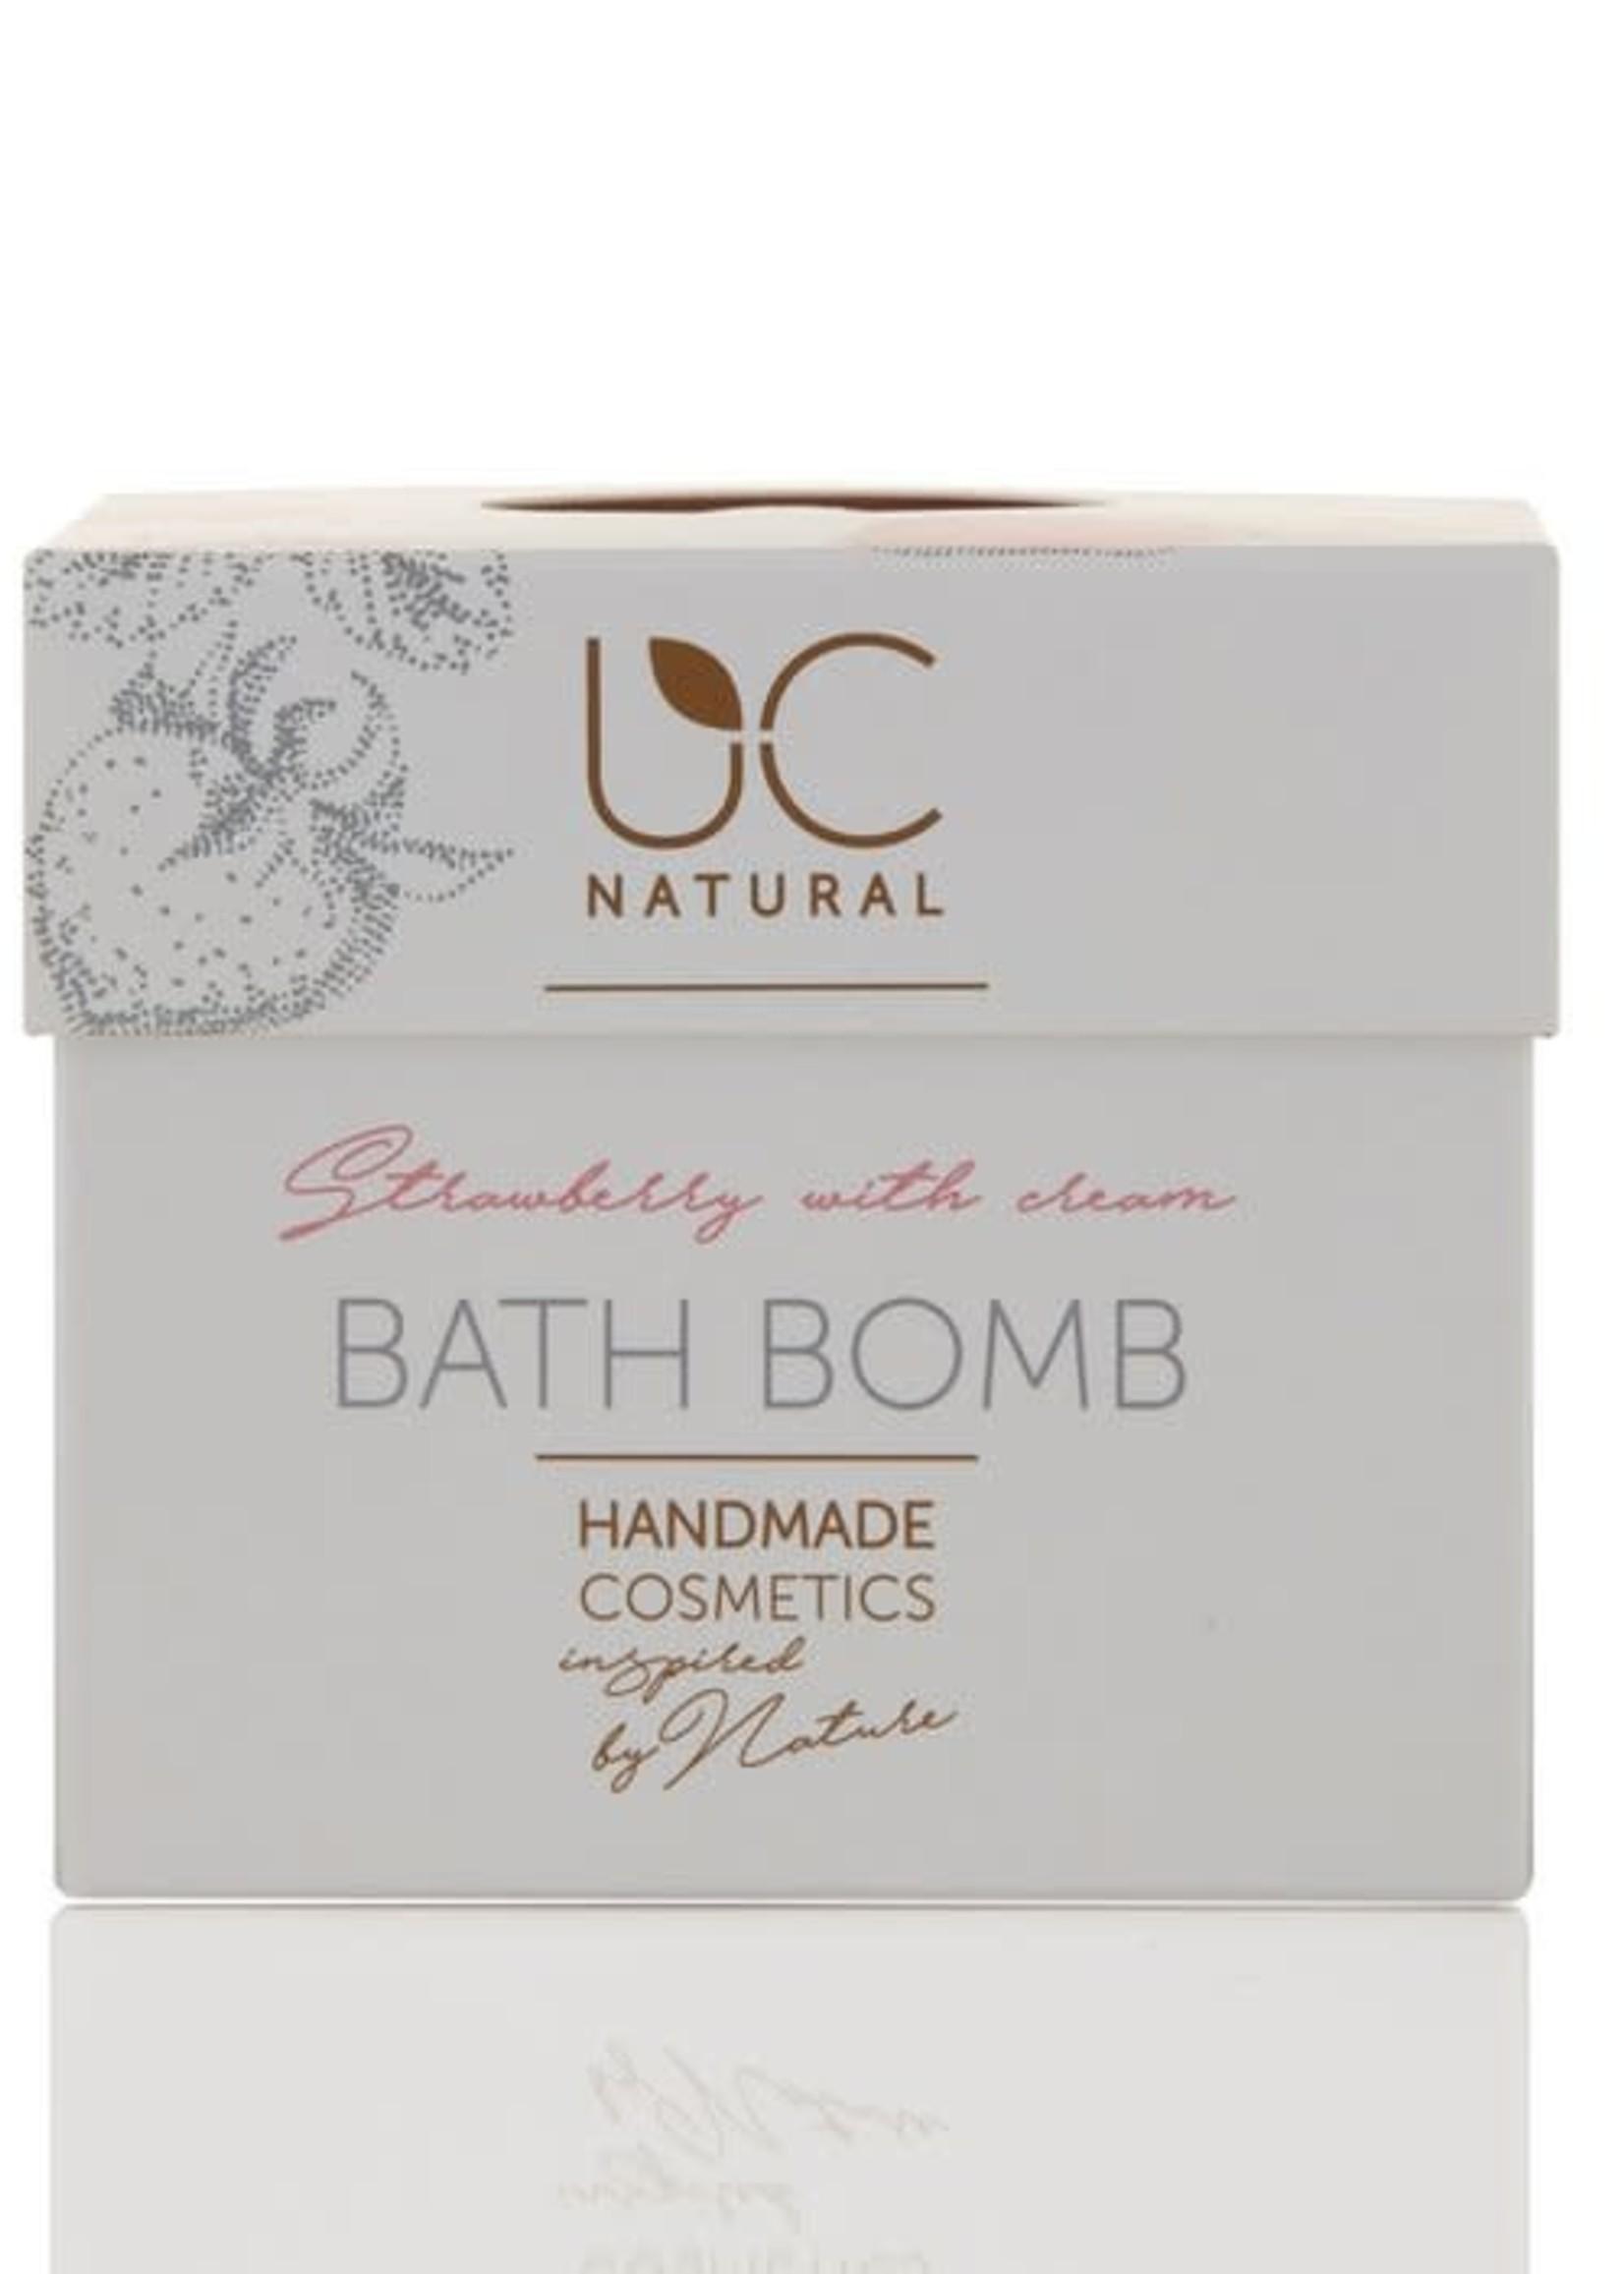 UC Naturel UC Natural - Bath Bomb - Strawberry with Cream